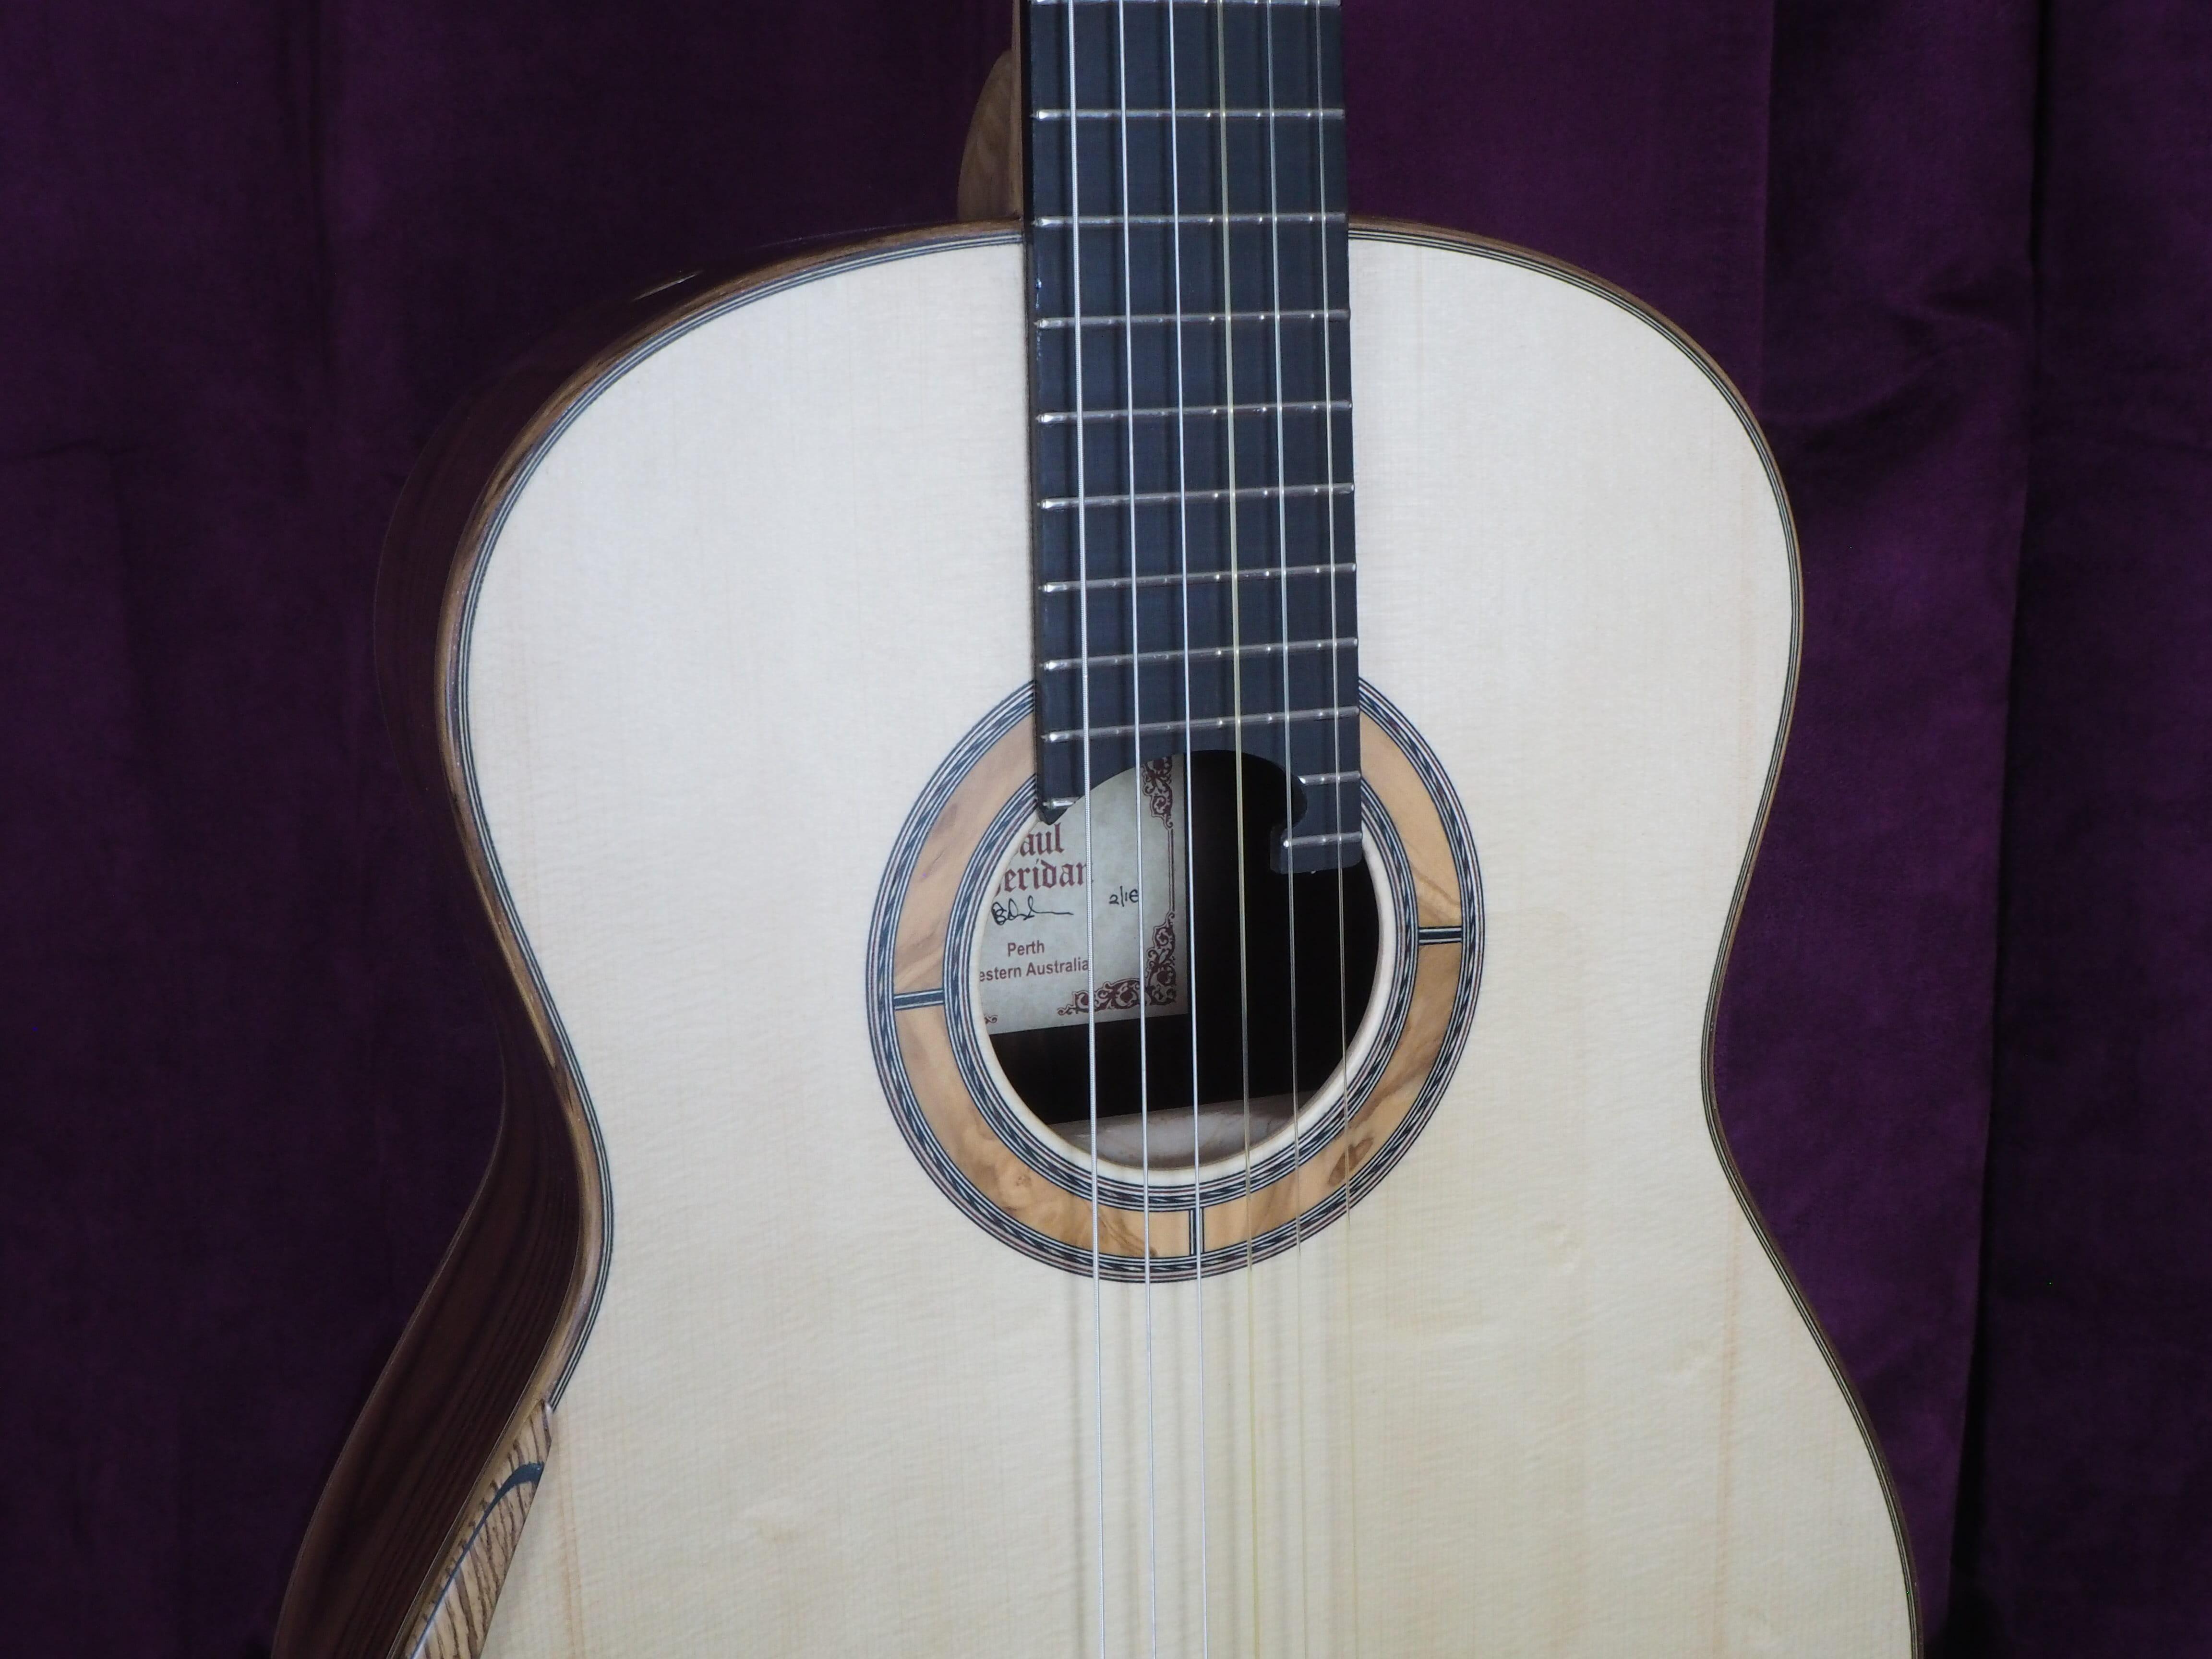 Paul sheridan guitare classique luthier lattice